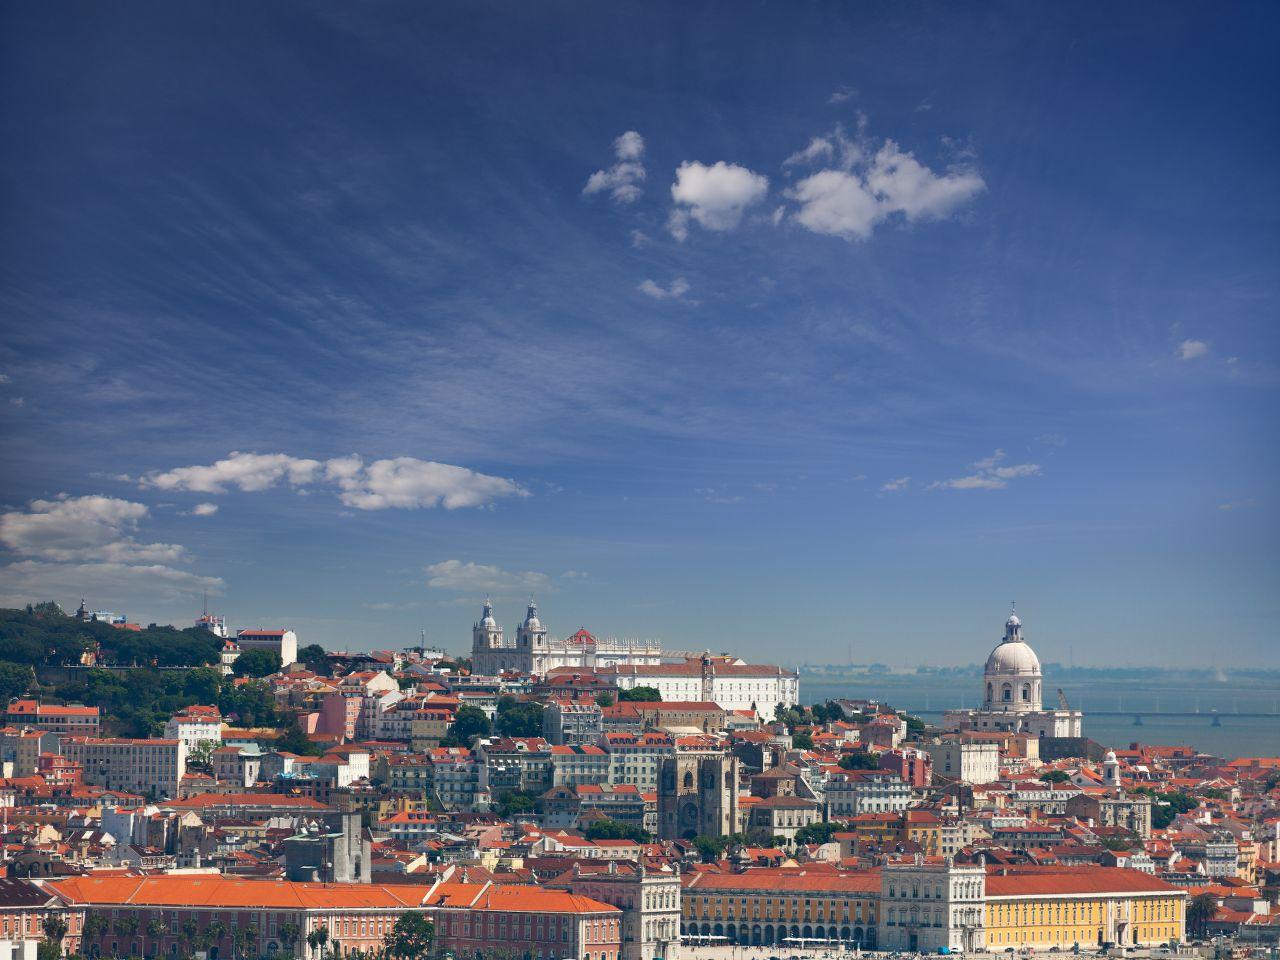 lissabon-portugal-taiga-fotolia-com-x